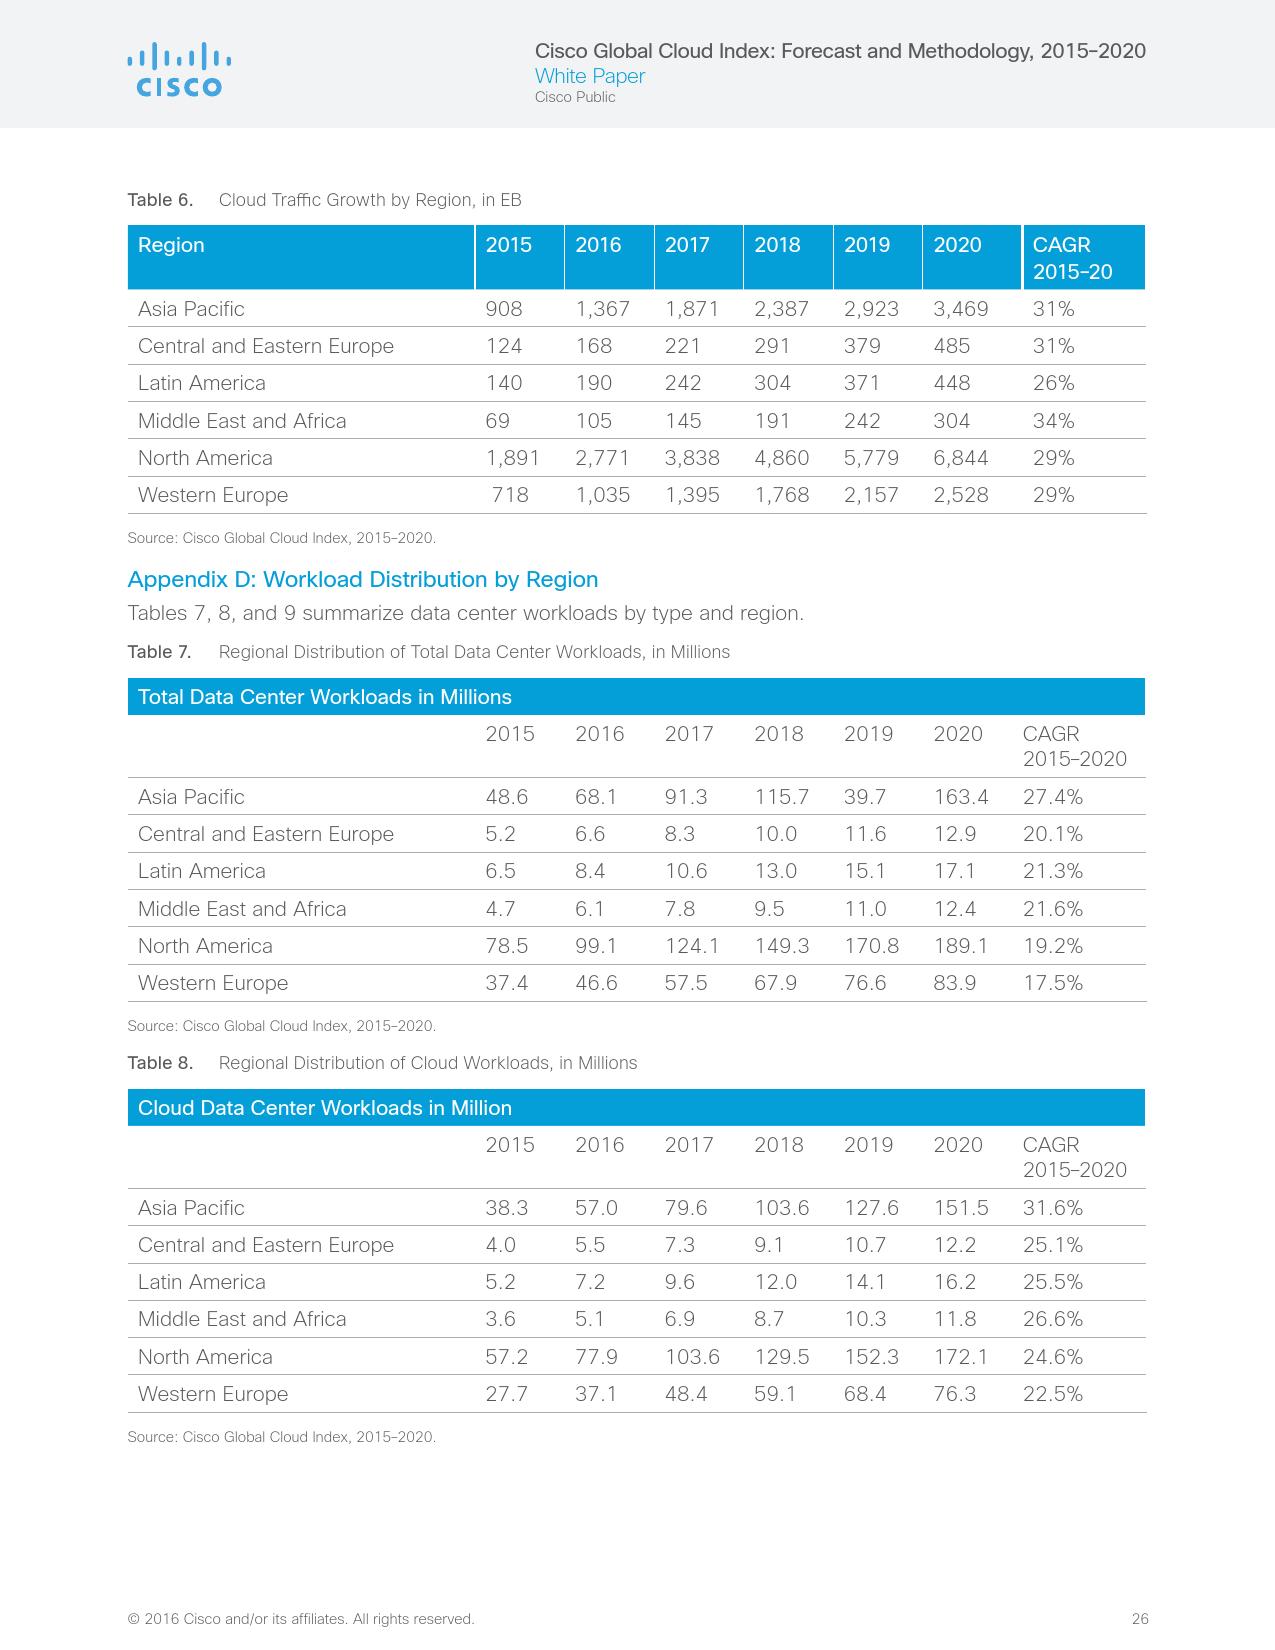 2015-2020%e5%85%a8%e7%90%83%e5%b9%b4%e5%ba%a6%e4%ba%91%e6%8c%87%e6%95%b0%e6%8a%a5%e5%91%8a_000026